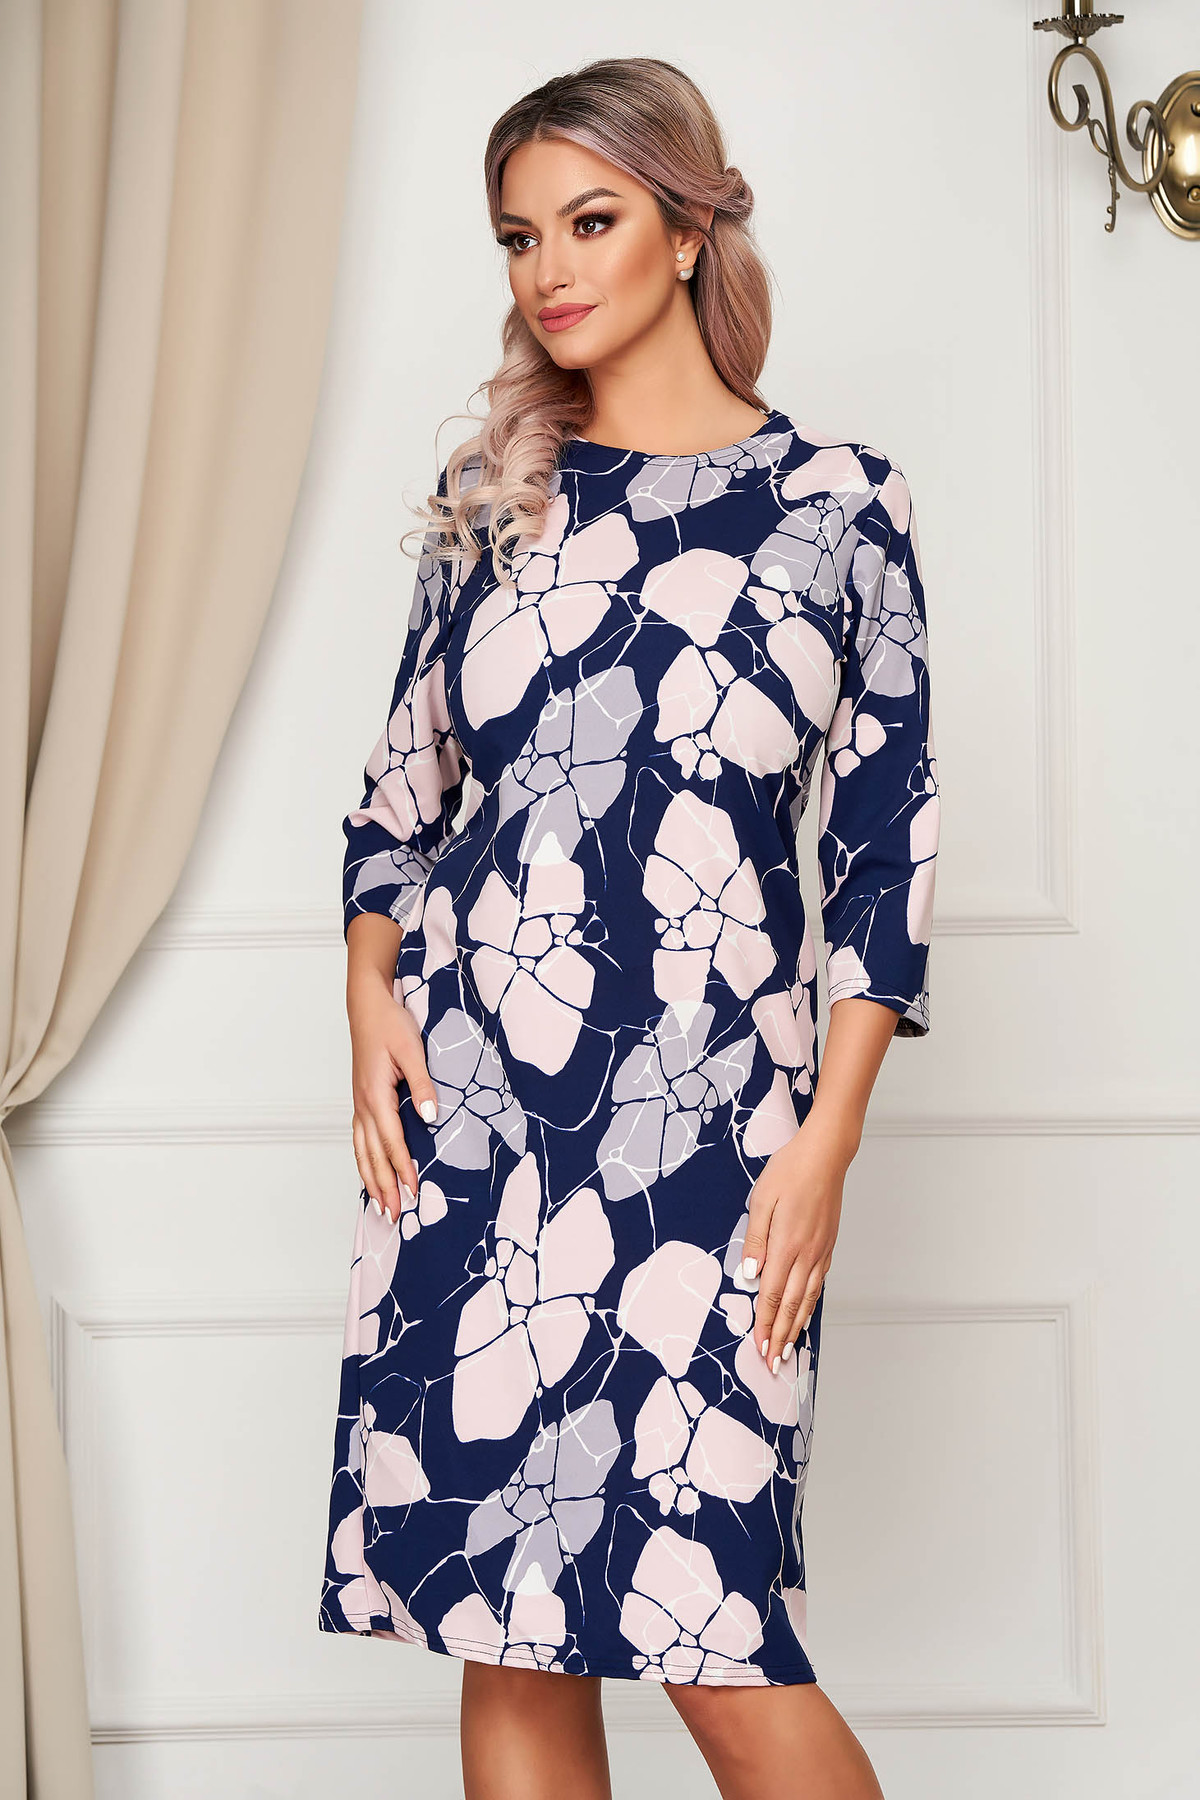 Rochie Lady Pandora Cu Imprimeu Floral Midi De Zi Cu Un Croi Drept Din Material Subtire Si Elastic